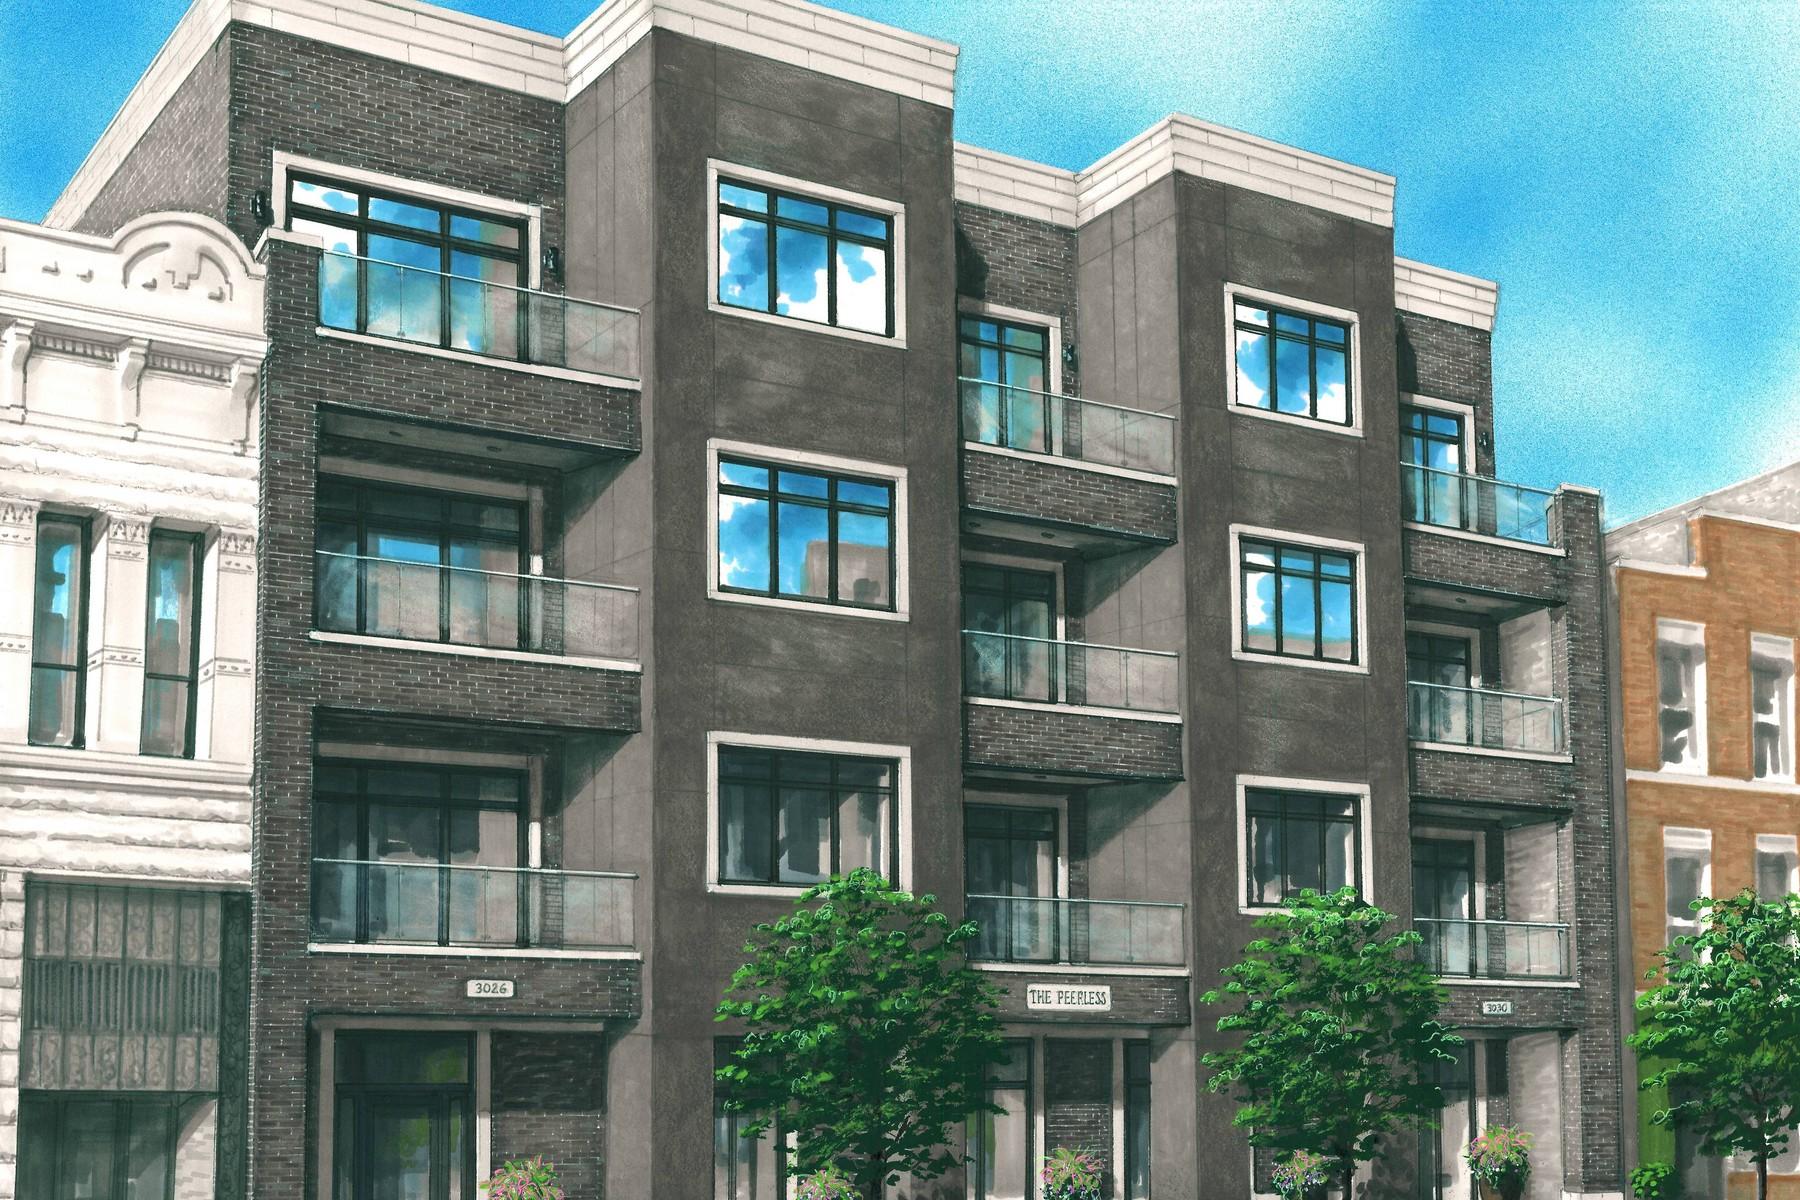 Condominium for Sale at Luxury New Construction Condo 3026 N Lincoln Avenue Unit 4C Chicago, Illinois, 60657 United States